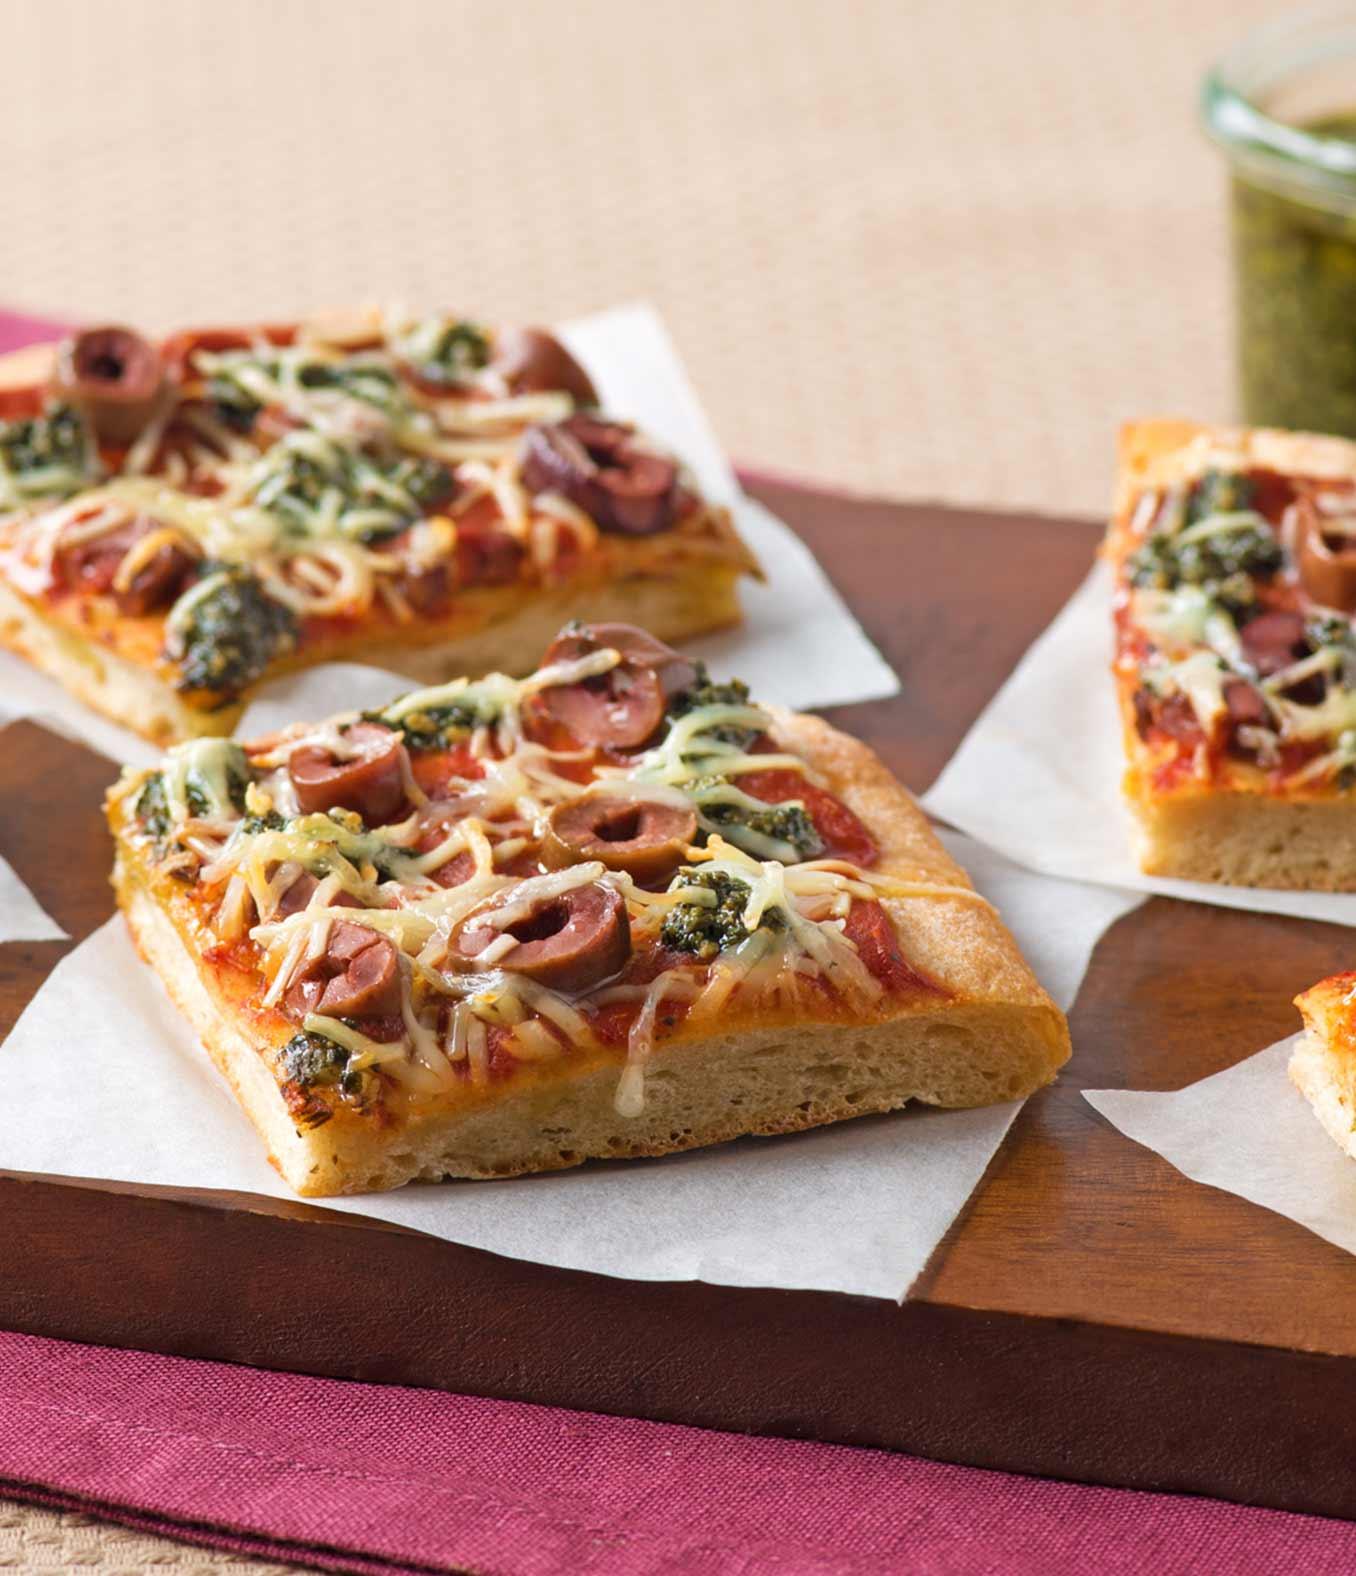 Cheese & Pesto Flatbread